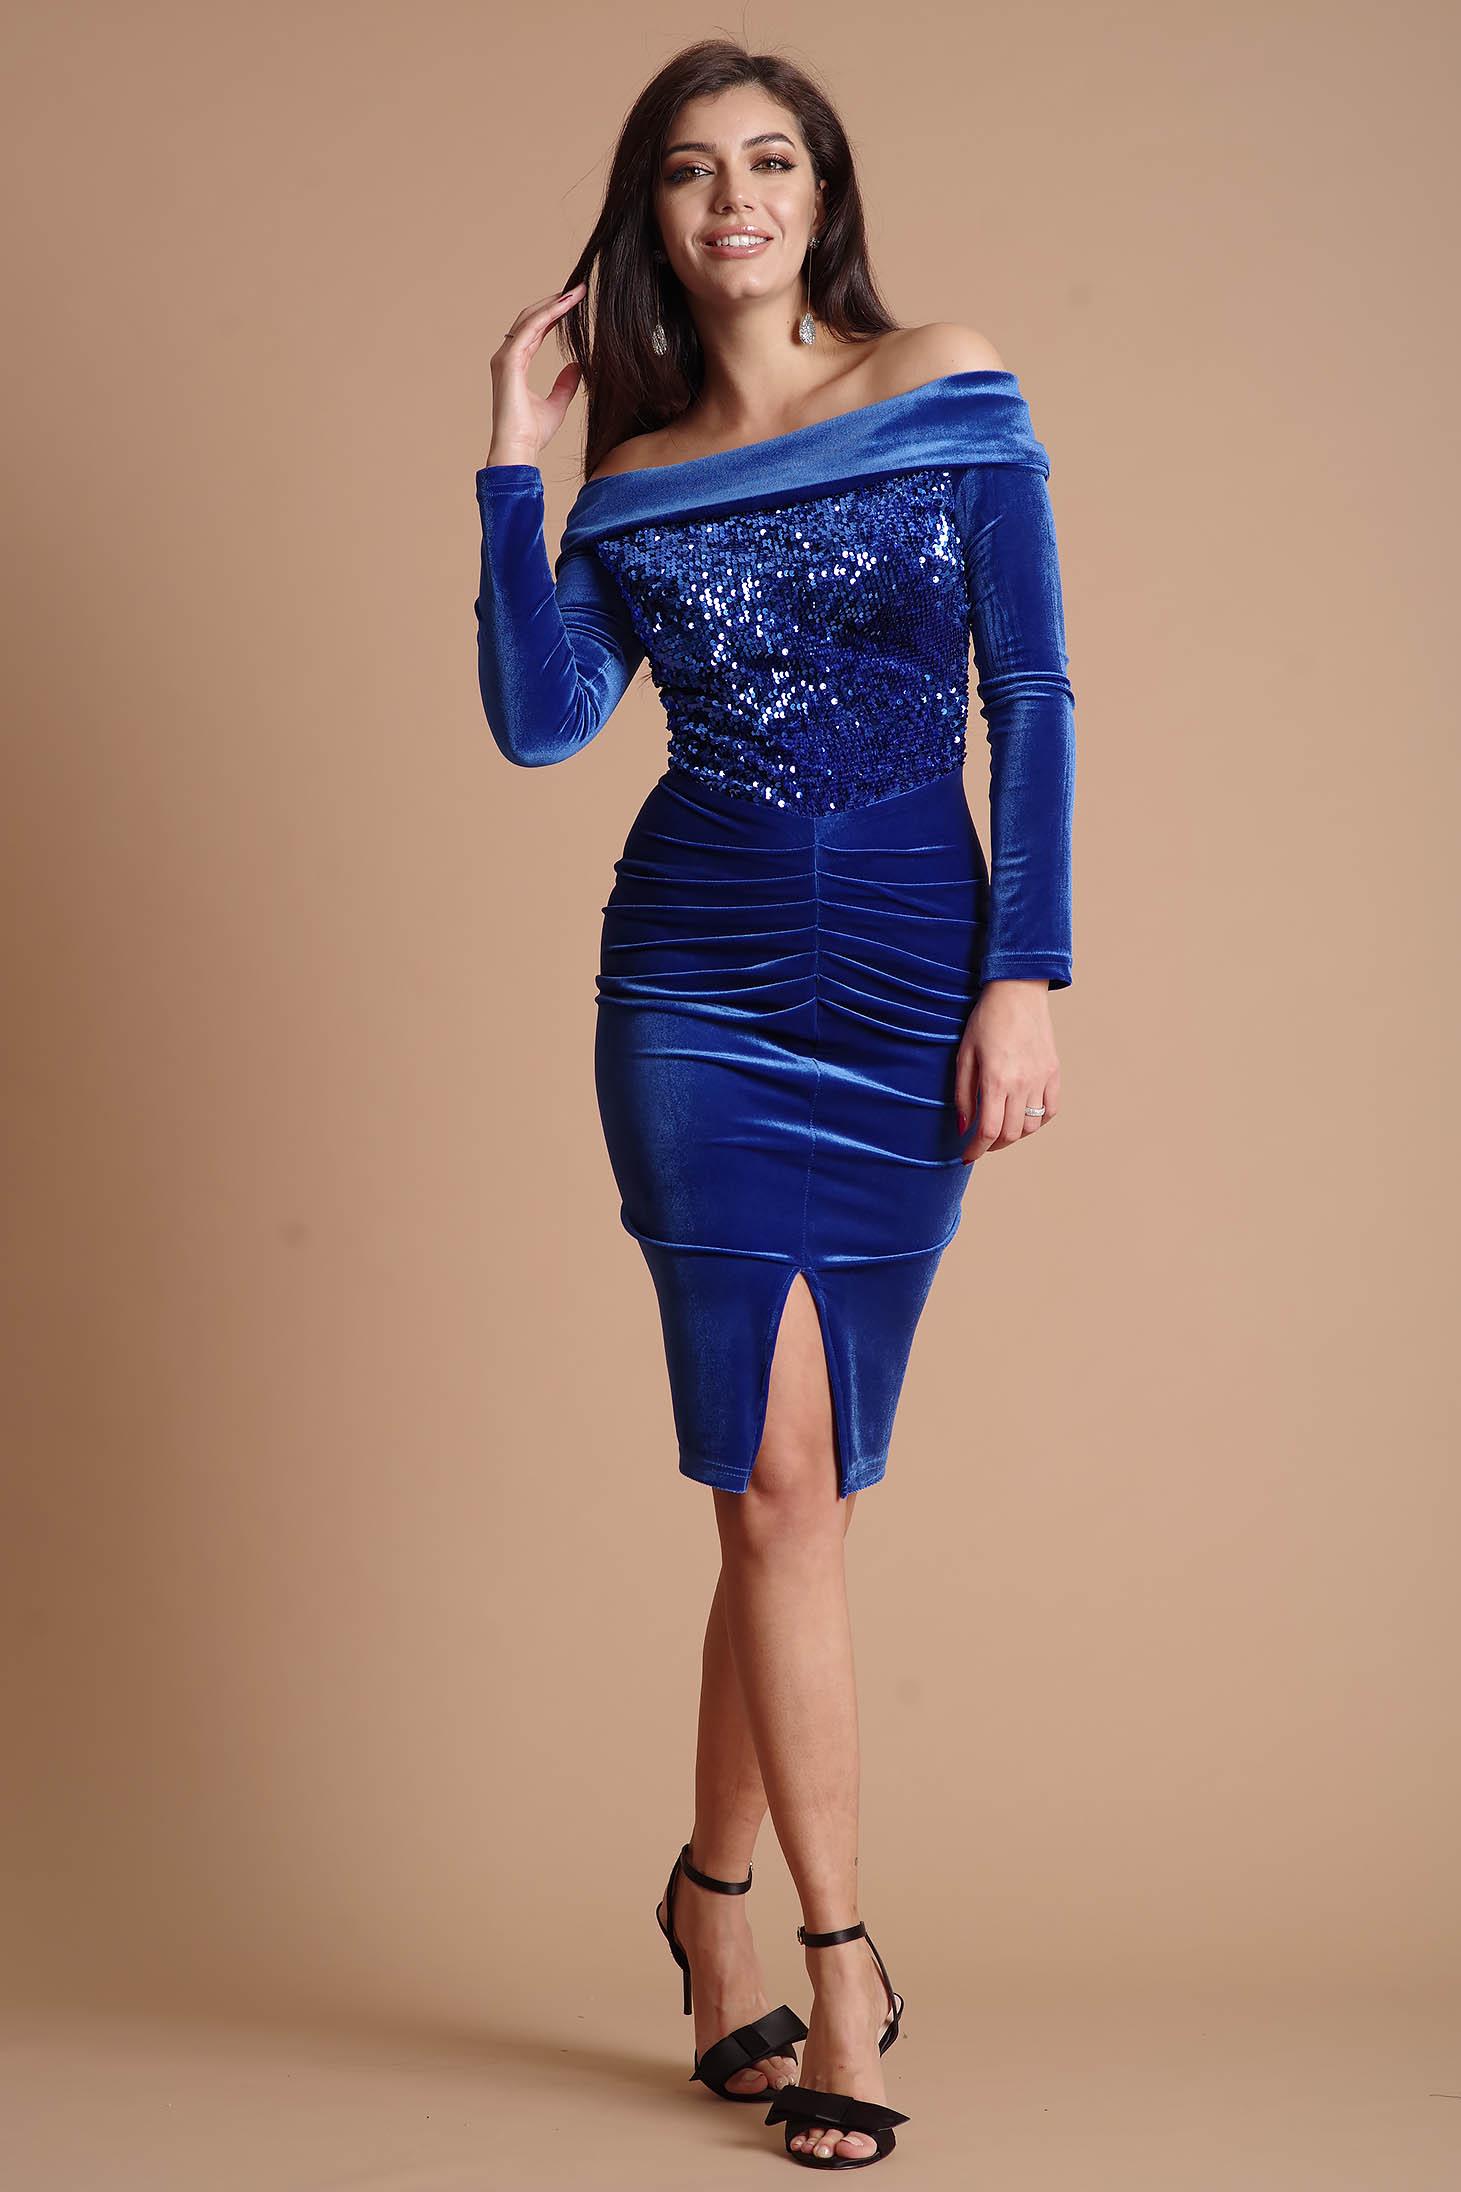 Rochie albastra midi de ocazie tip creion din catifea cu aplicatii cu paiete cu maneci lungi umeri goi fara captuseala